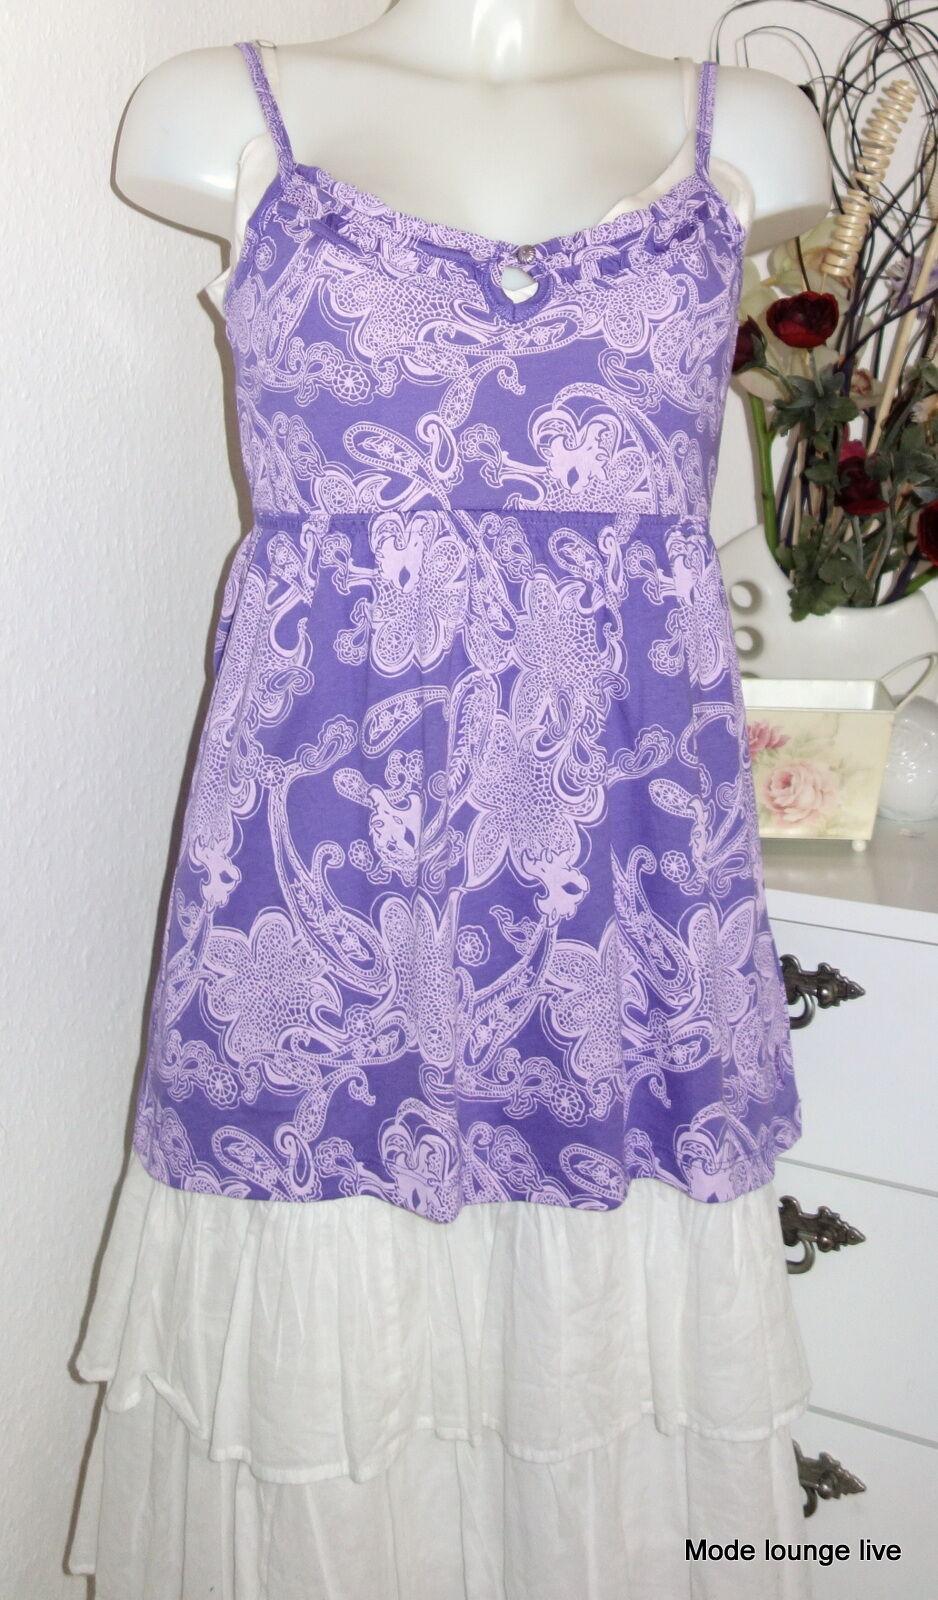 ESPRIT Long Top Tunika shirt M L XL purple bluemen purplet flower flieder